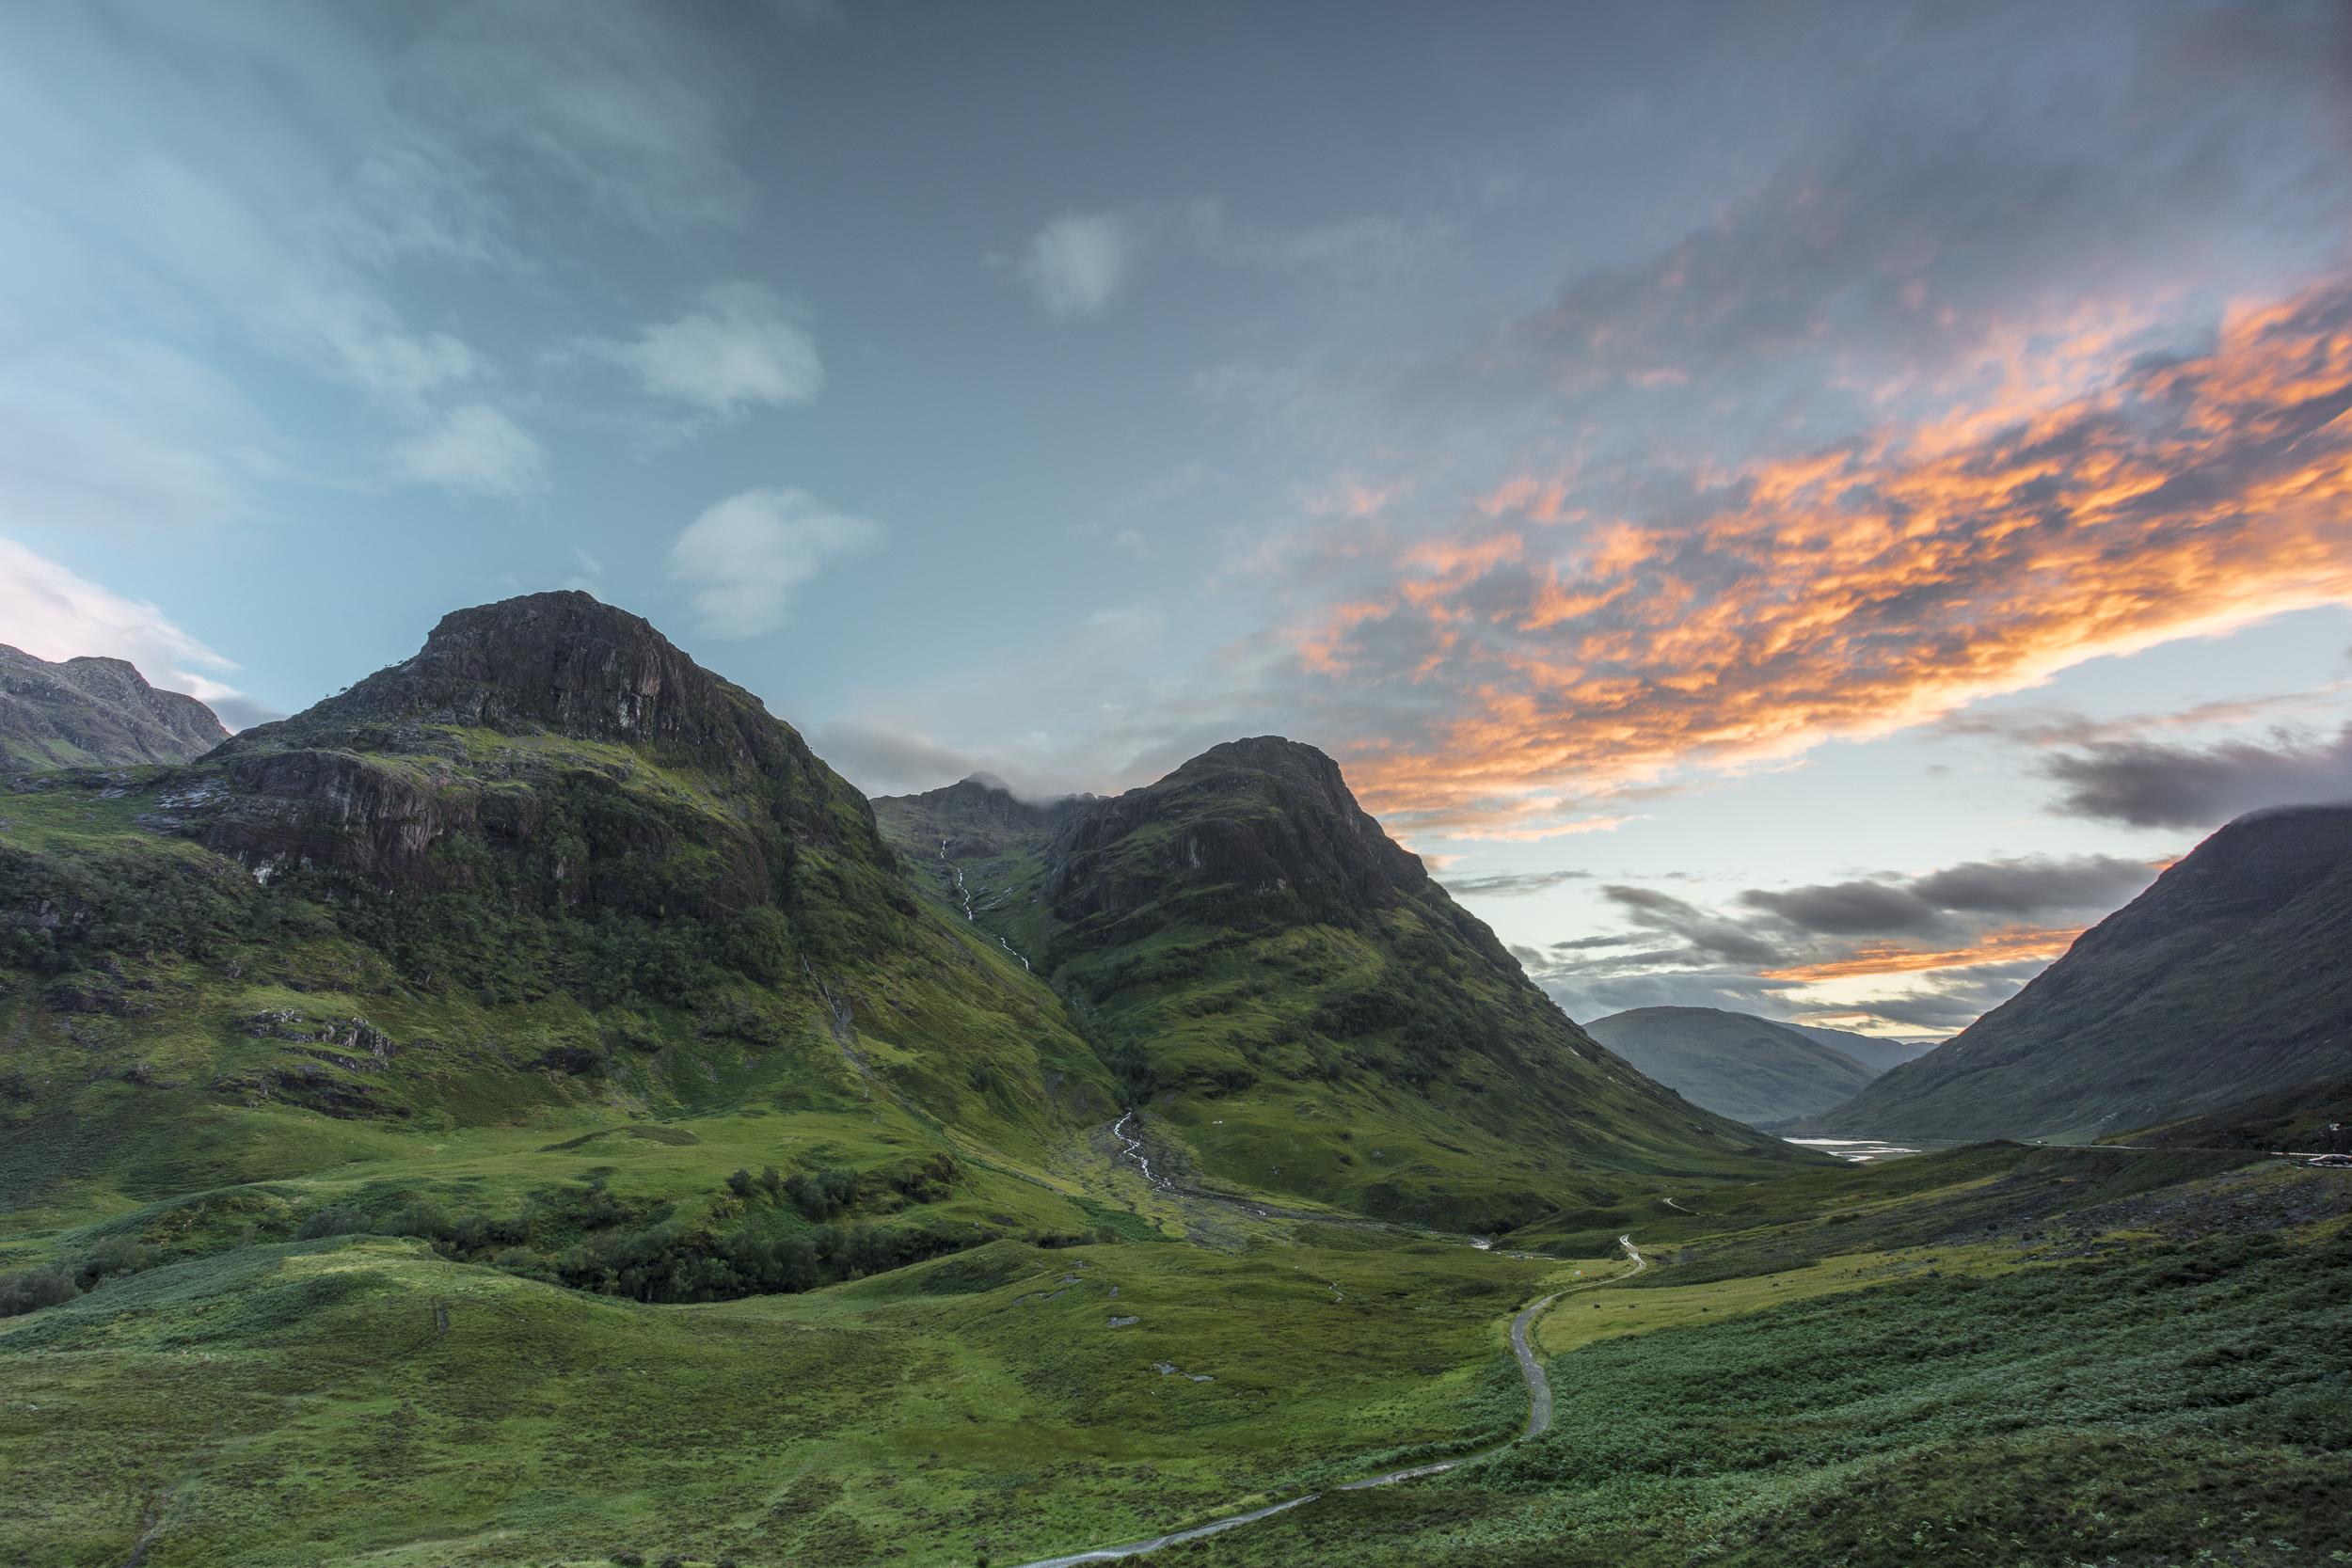 Three Sisters at sunset, Glencoe, Scotland - 21:22 4th August 2017